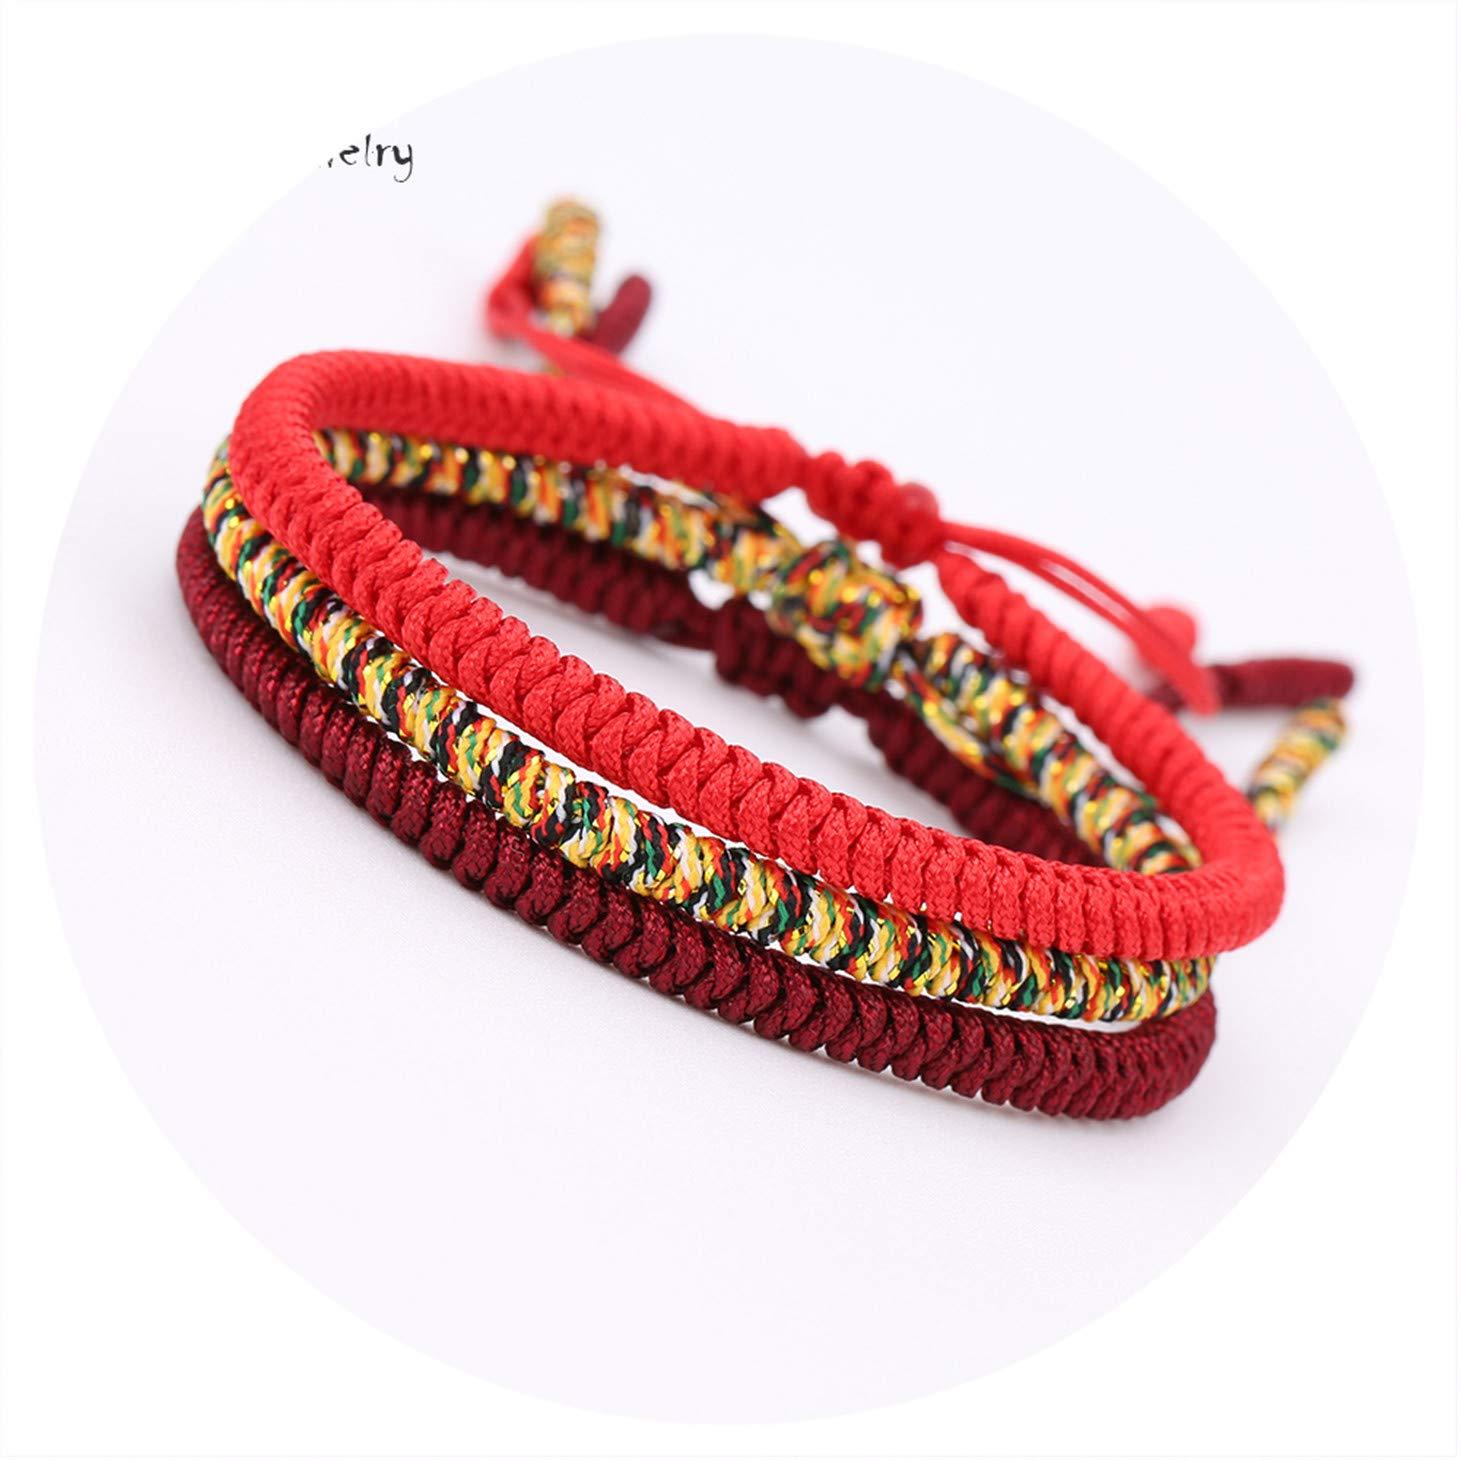 Olive Tayl 3PCS Multi Color Tibetan Buddhist Good Lucky Charm Tibetan Bracelets & Bangles for Women Men Handma by Olive Tayl (Image #2)